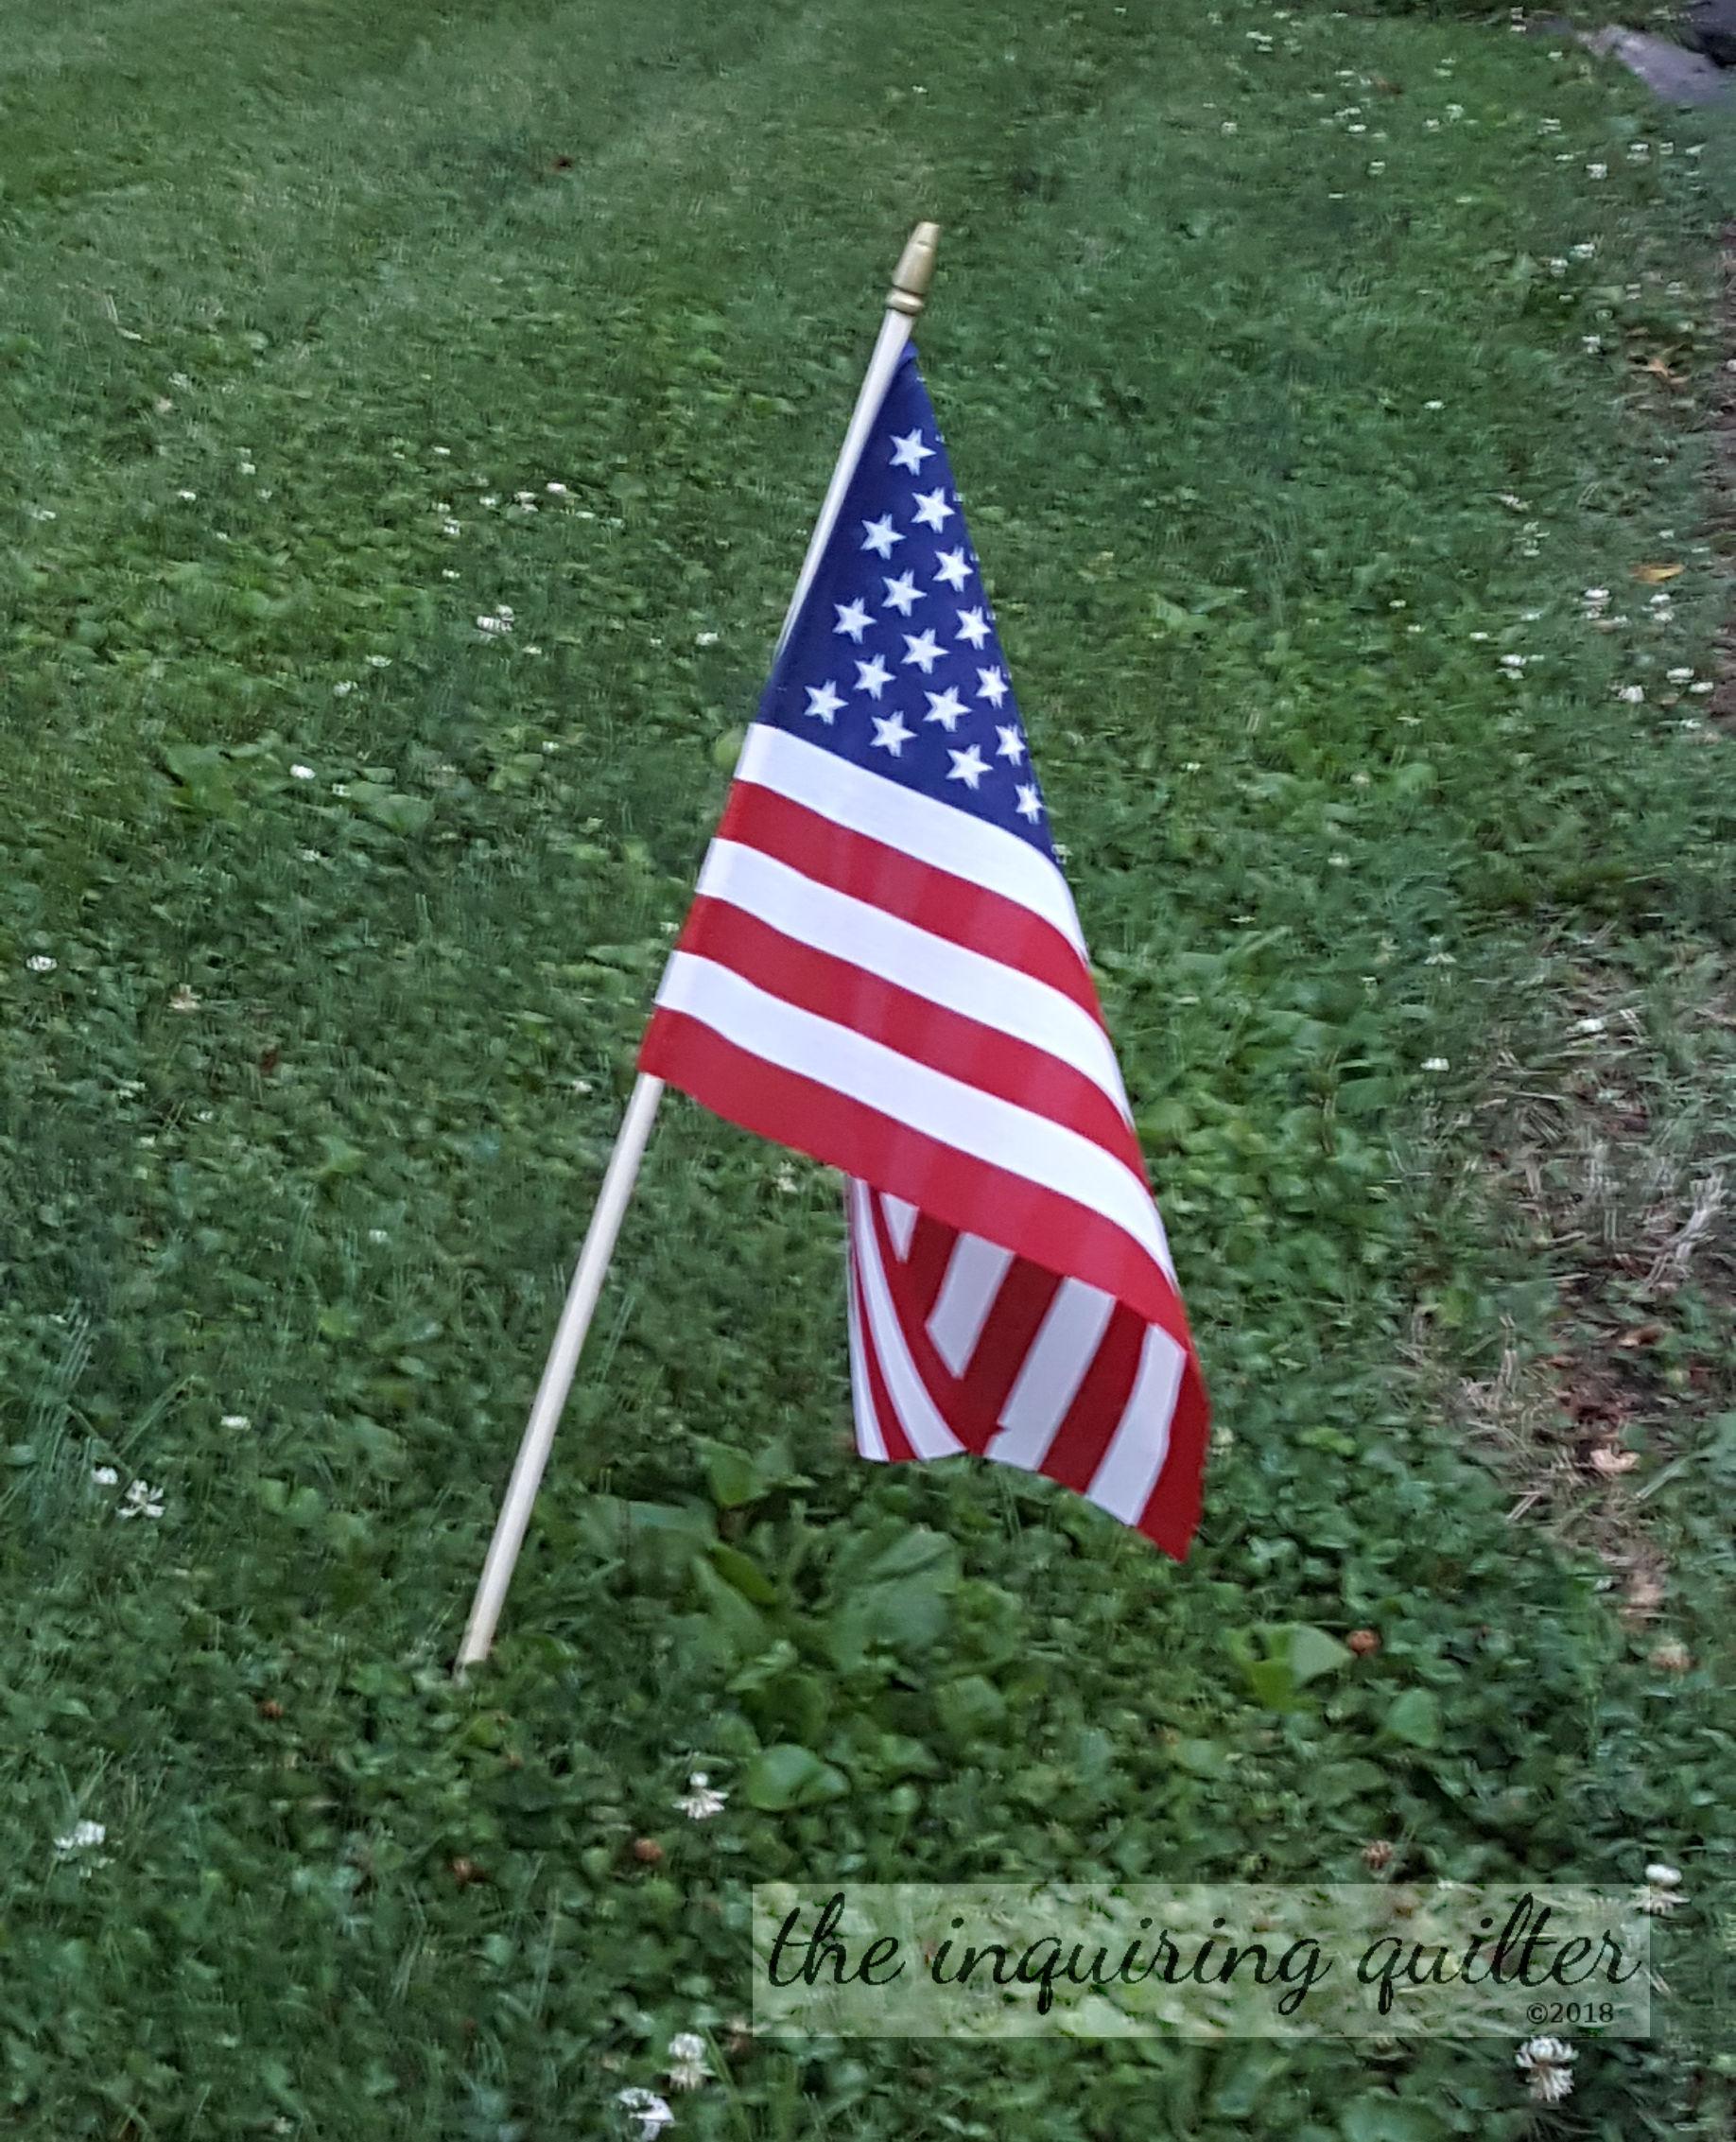 Planting flags July Fourth 2017 2.jpg